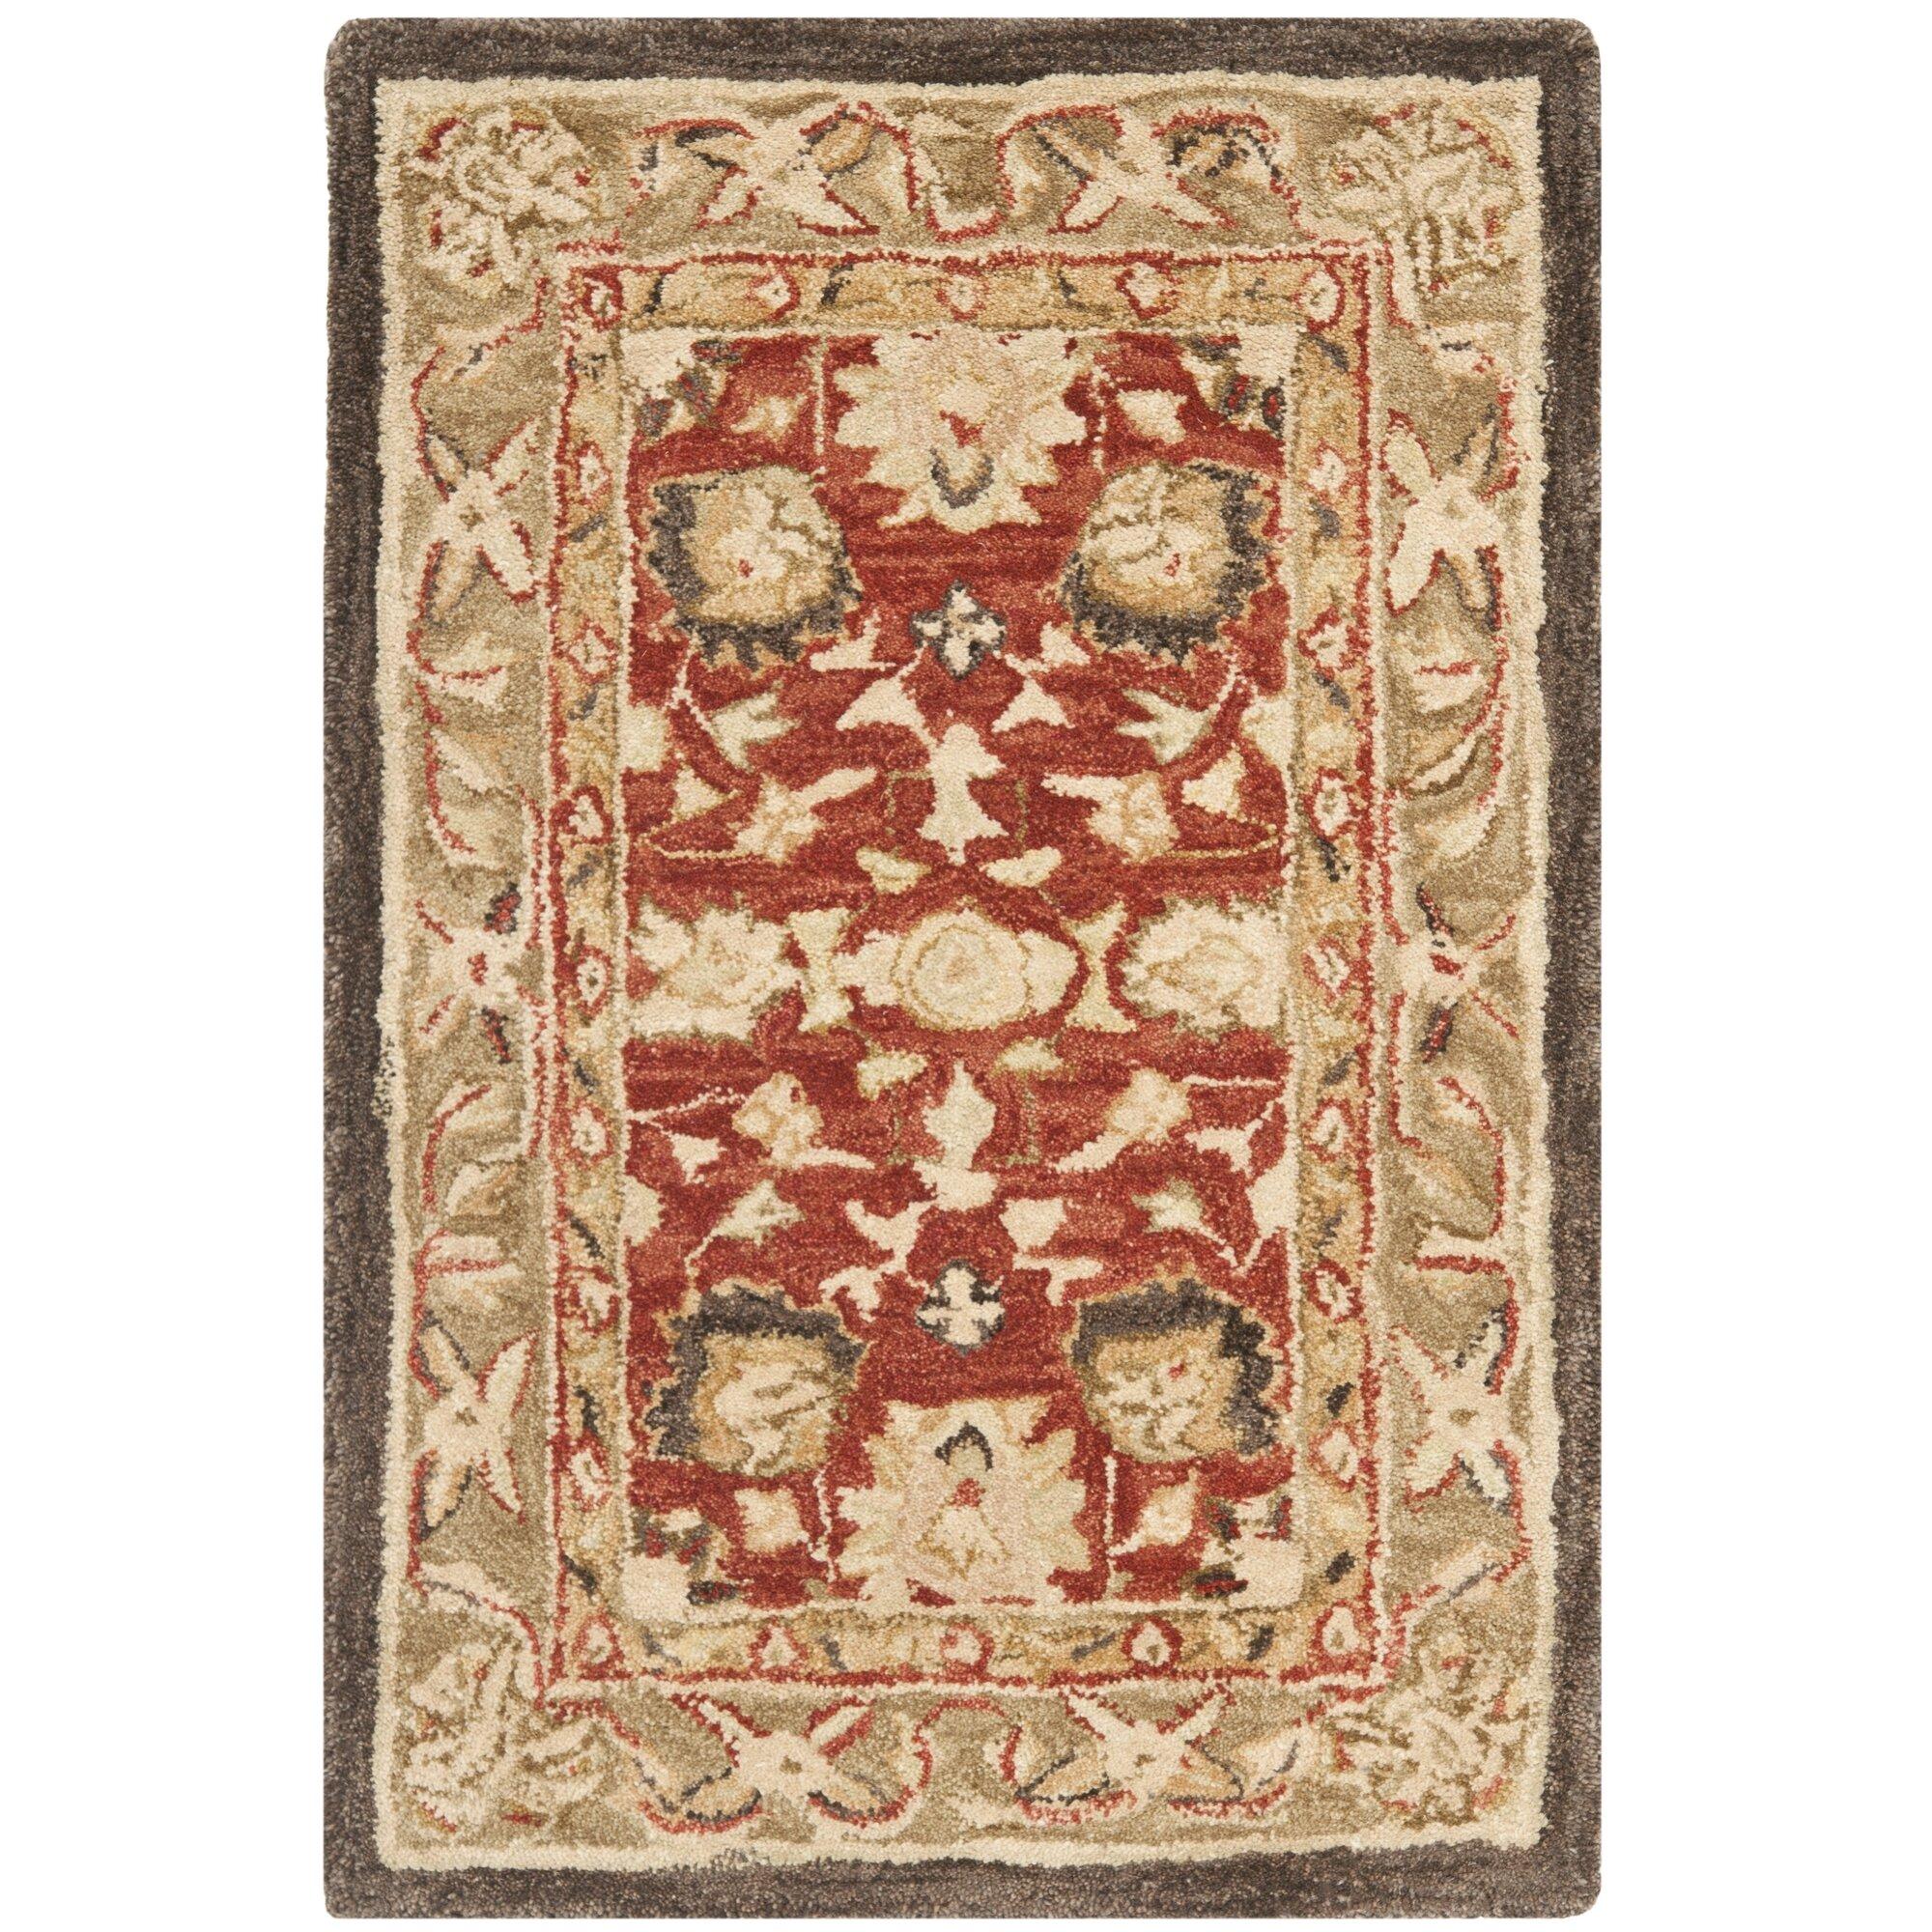 Safavieh anatolia rust green area rug reviews wayfair for Safavieh rugs